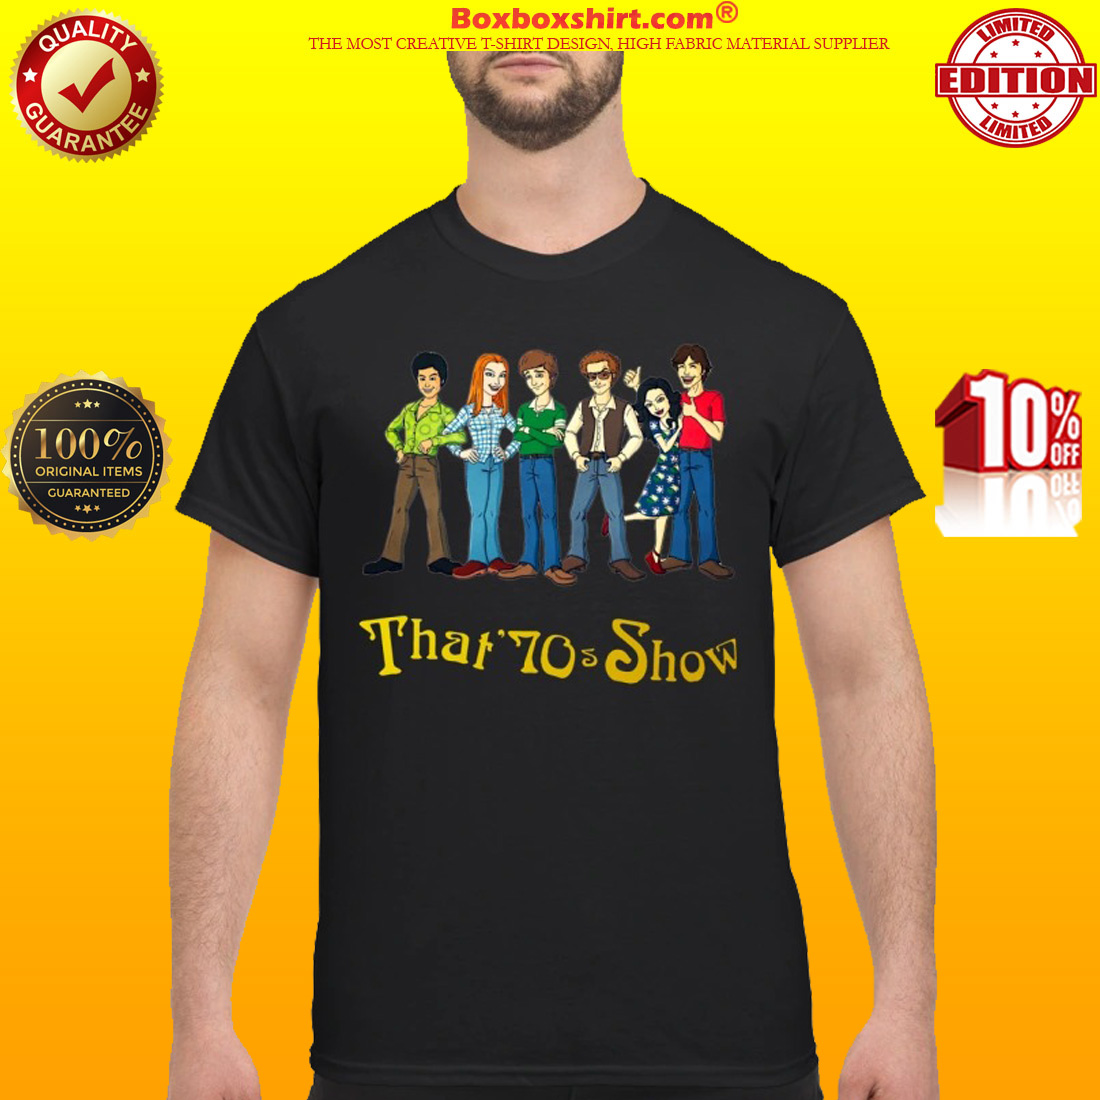 That 70s show cartoon classic shirt